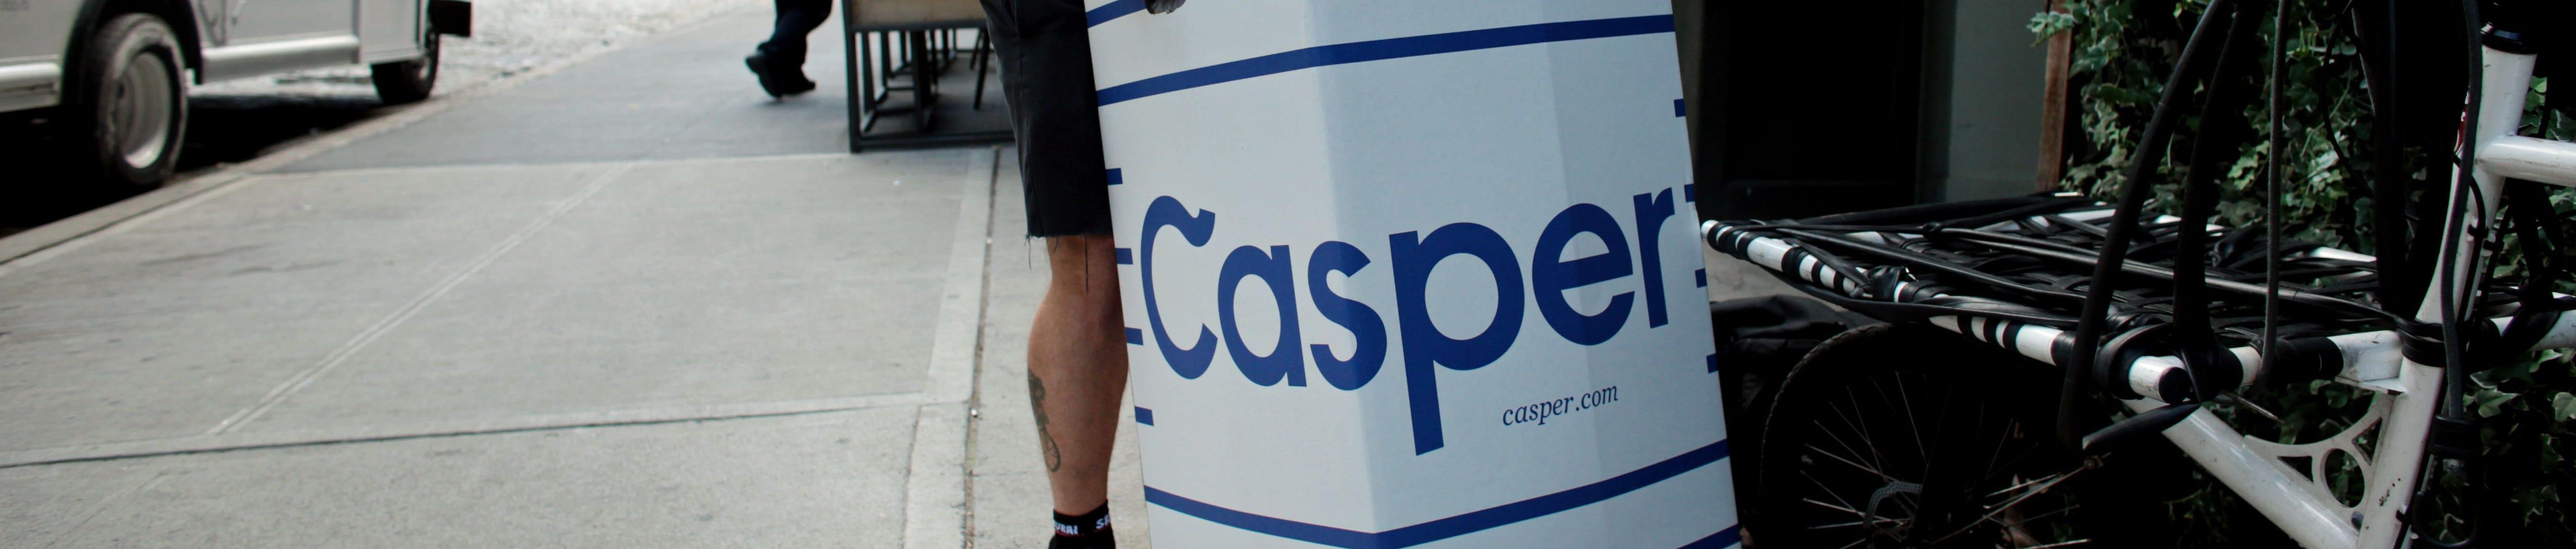 Casper Mattress Dilemma, PopSugar Fitness Me…